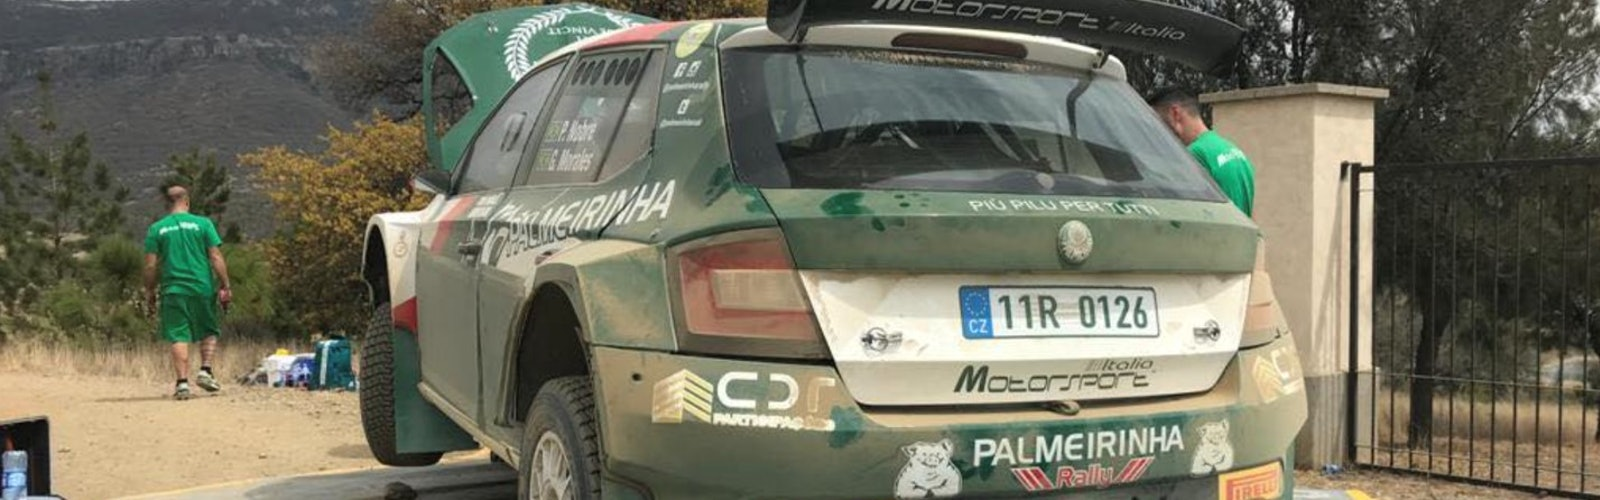 Motorsport Italia Rally Mexico